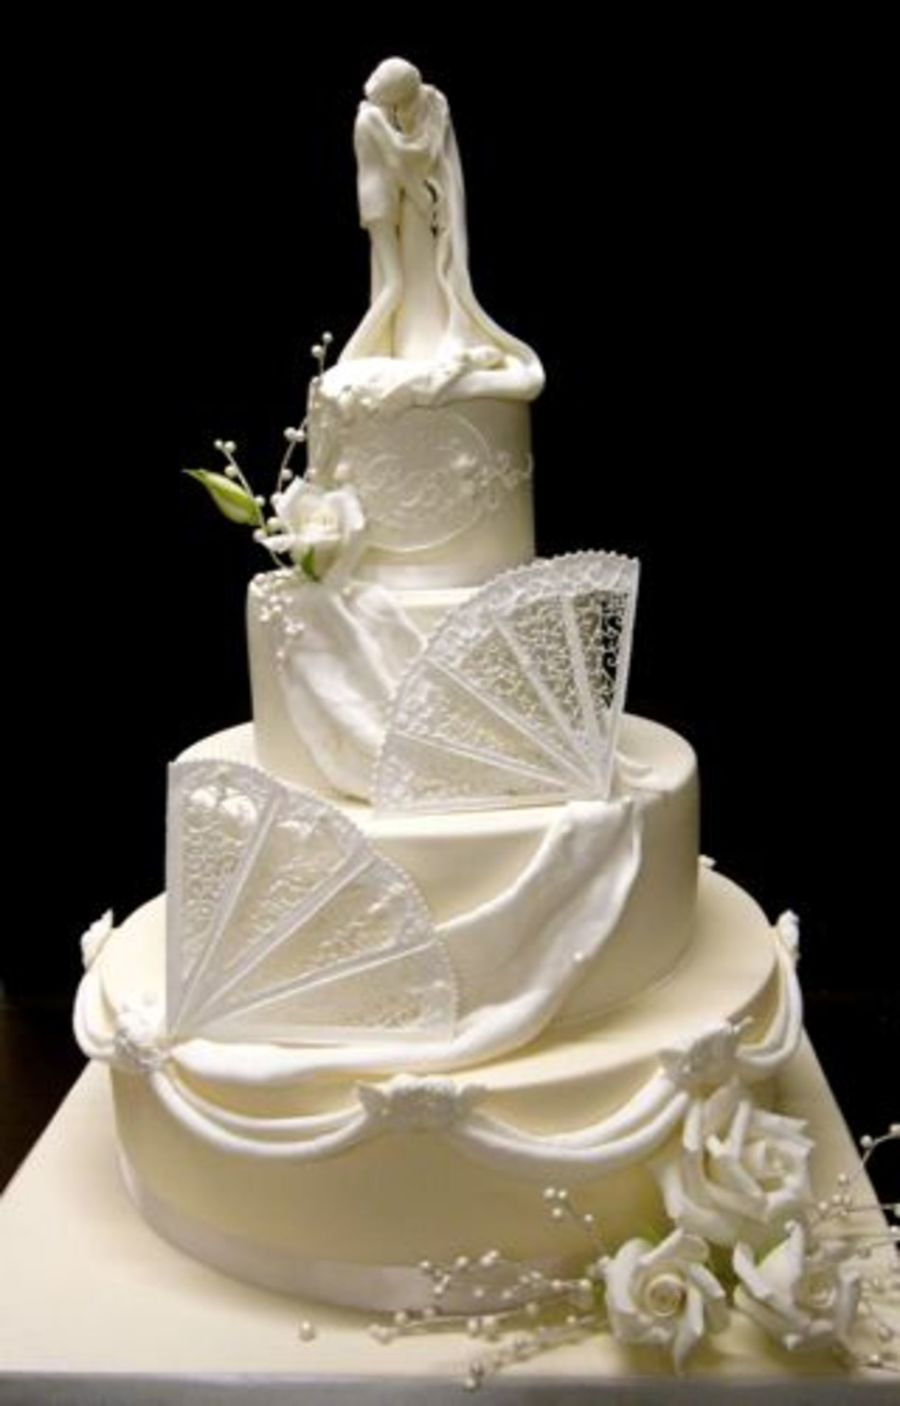 Royal Icing Wedding Cakes  Ivory And White Wedding Cake With Royal Icing Fans And